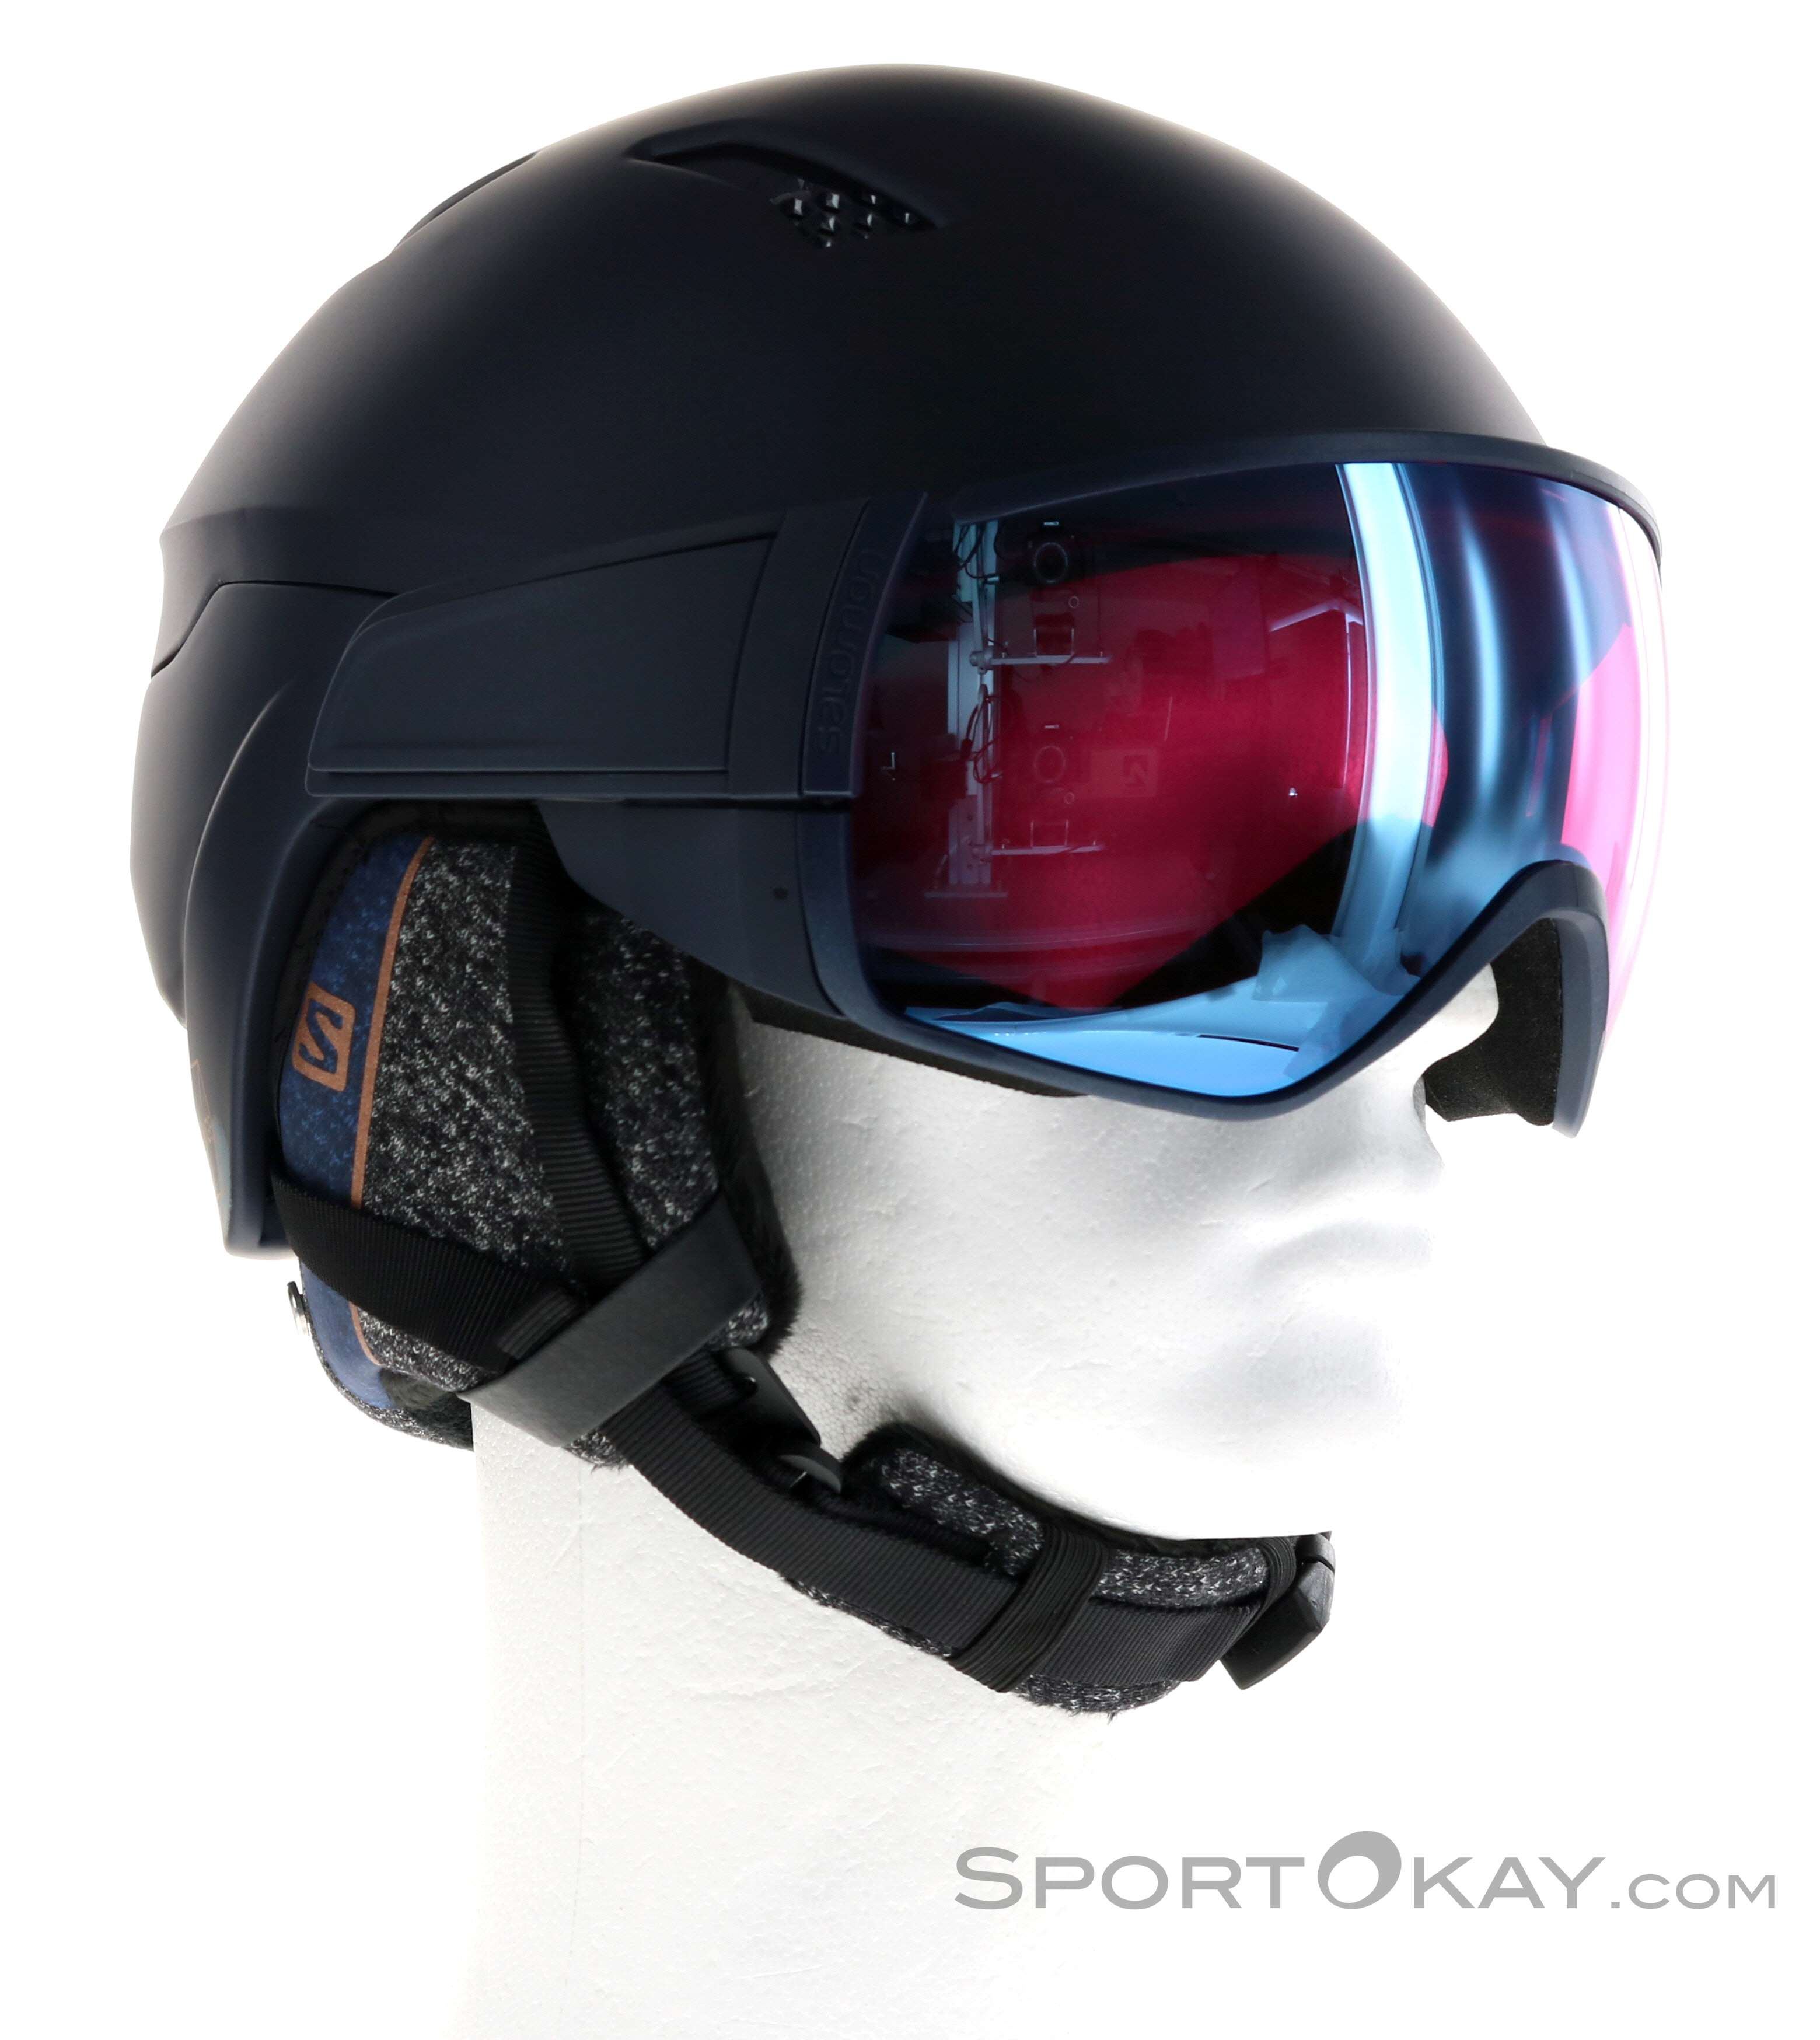 Vegetales Vacaciones Aliviar  Salomon Mirage CA Sigma Damen Ski Helmet with Visor - Ski Helmets - Ski  Helmets & Accessory - Ski & Freeride - All